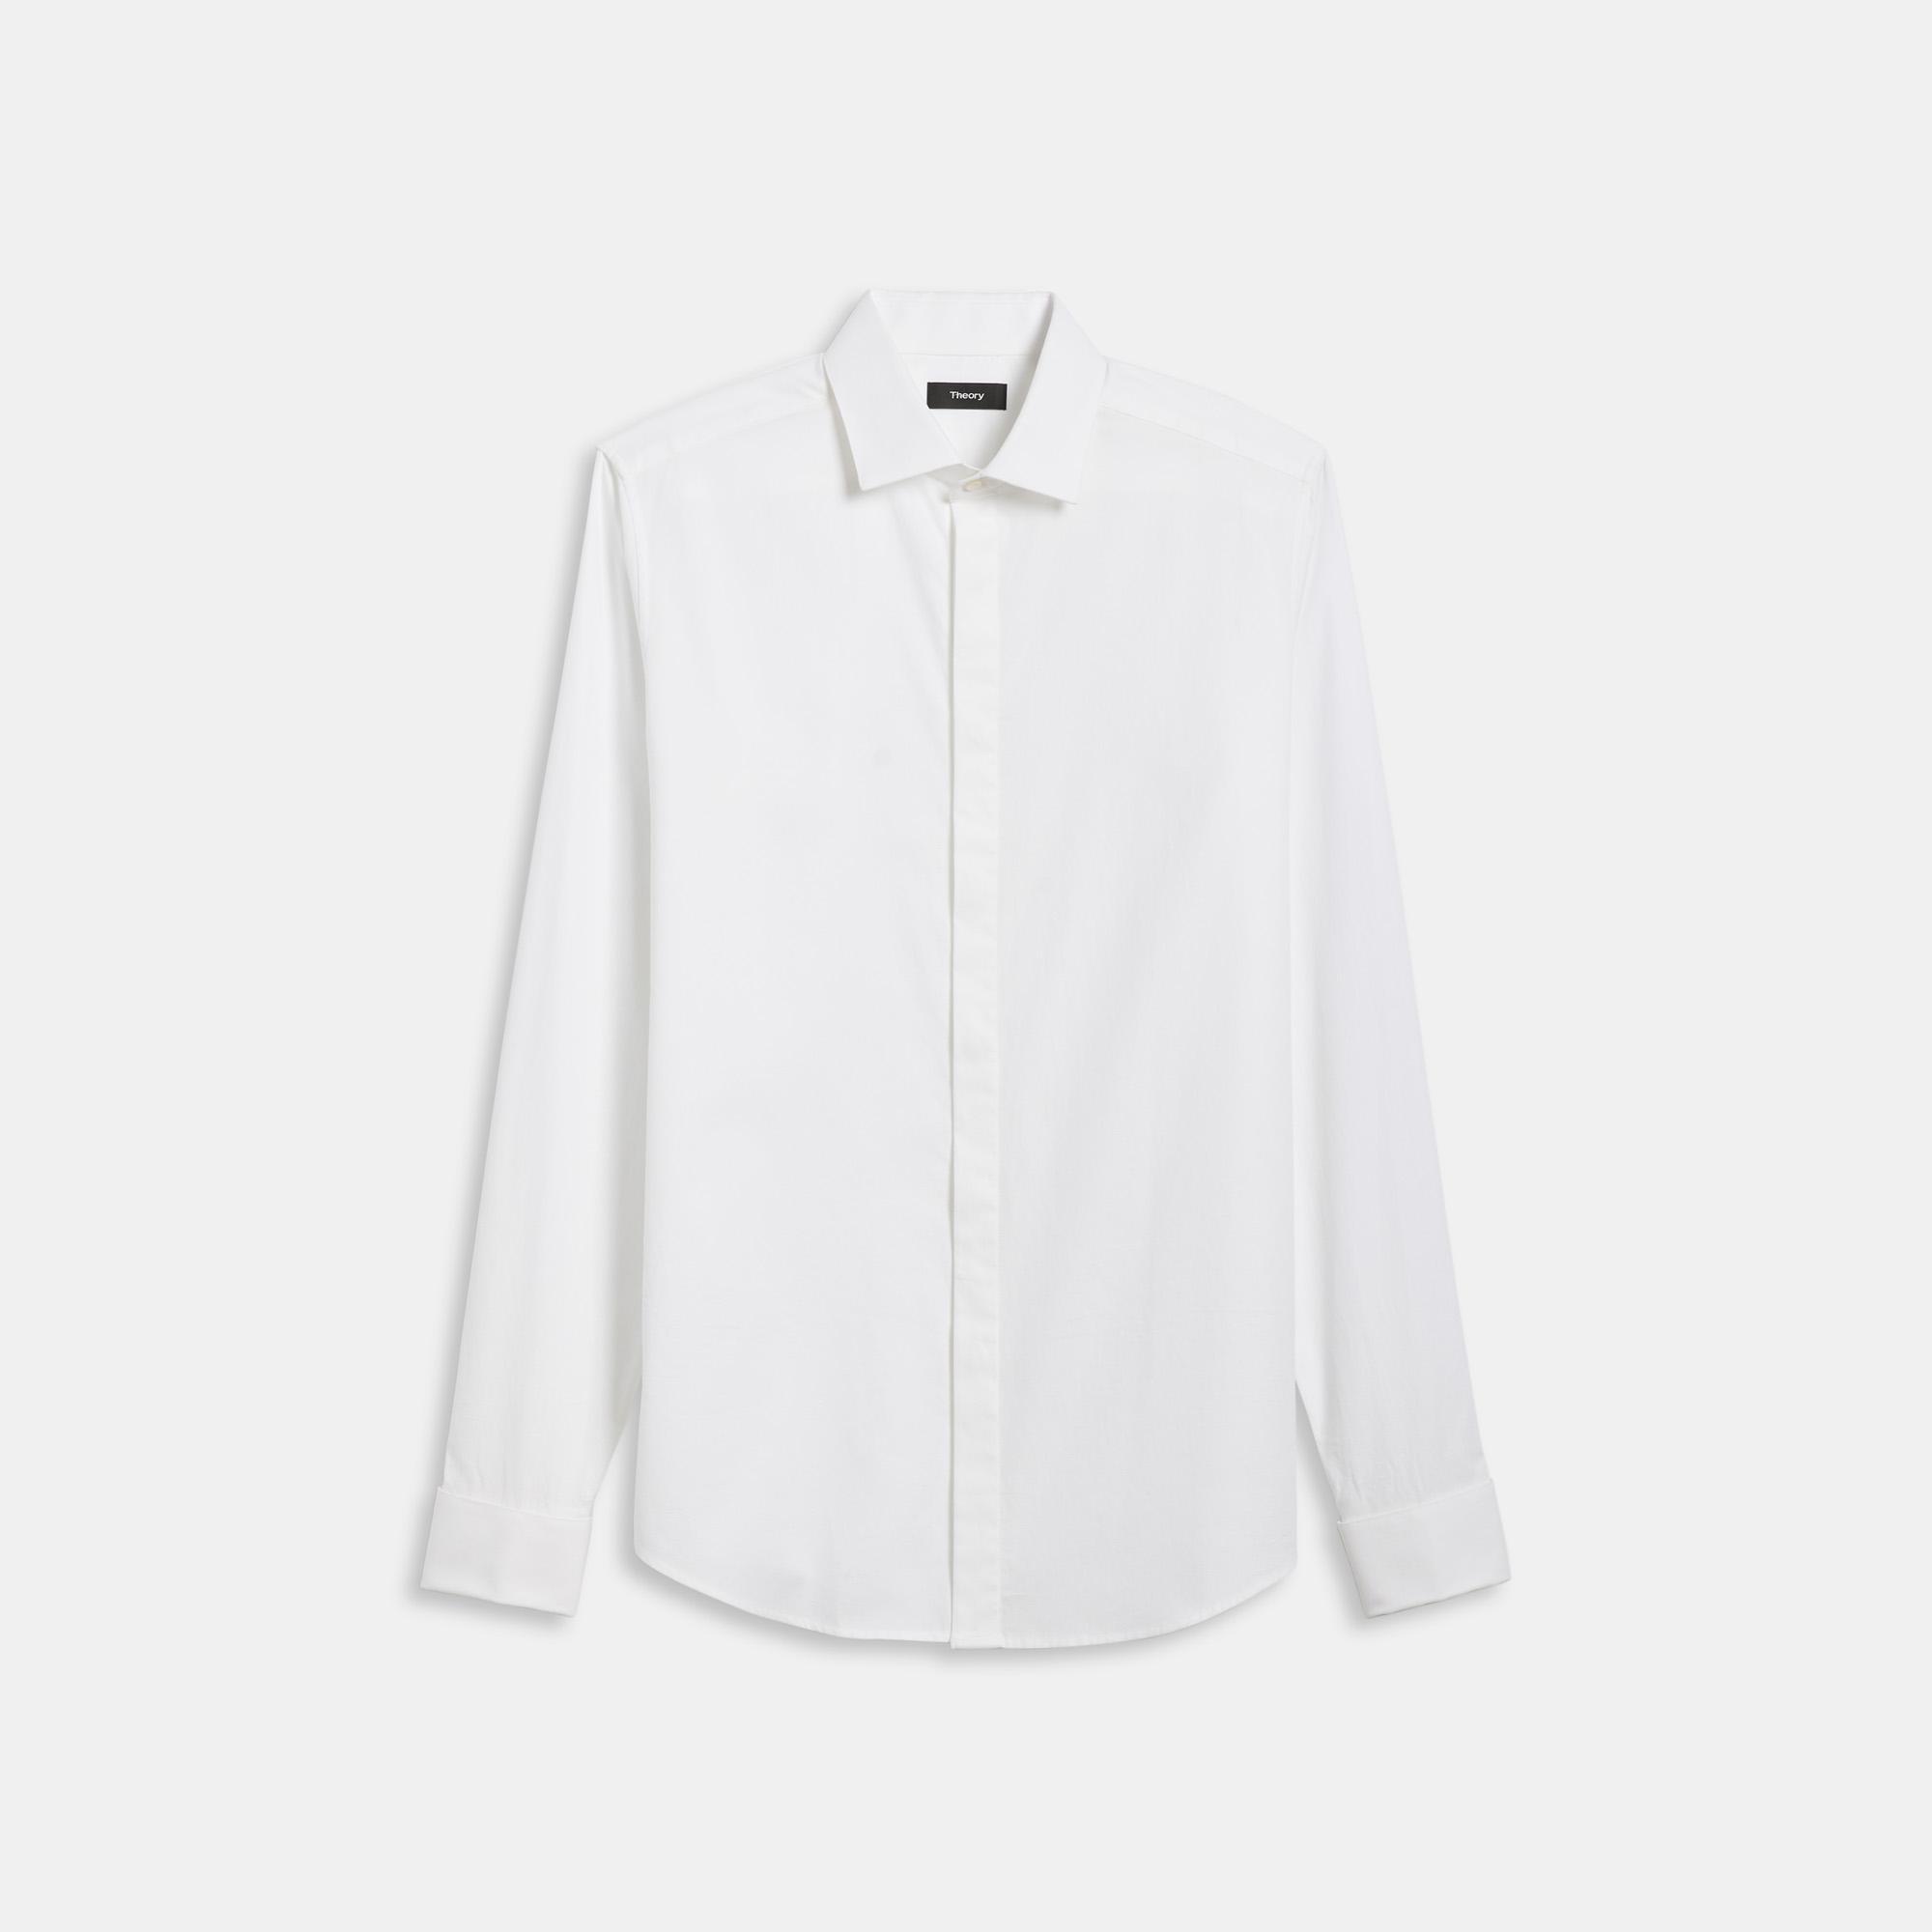 Theory Stretch Cotton Tuxedo Shirt